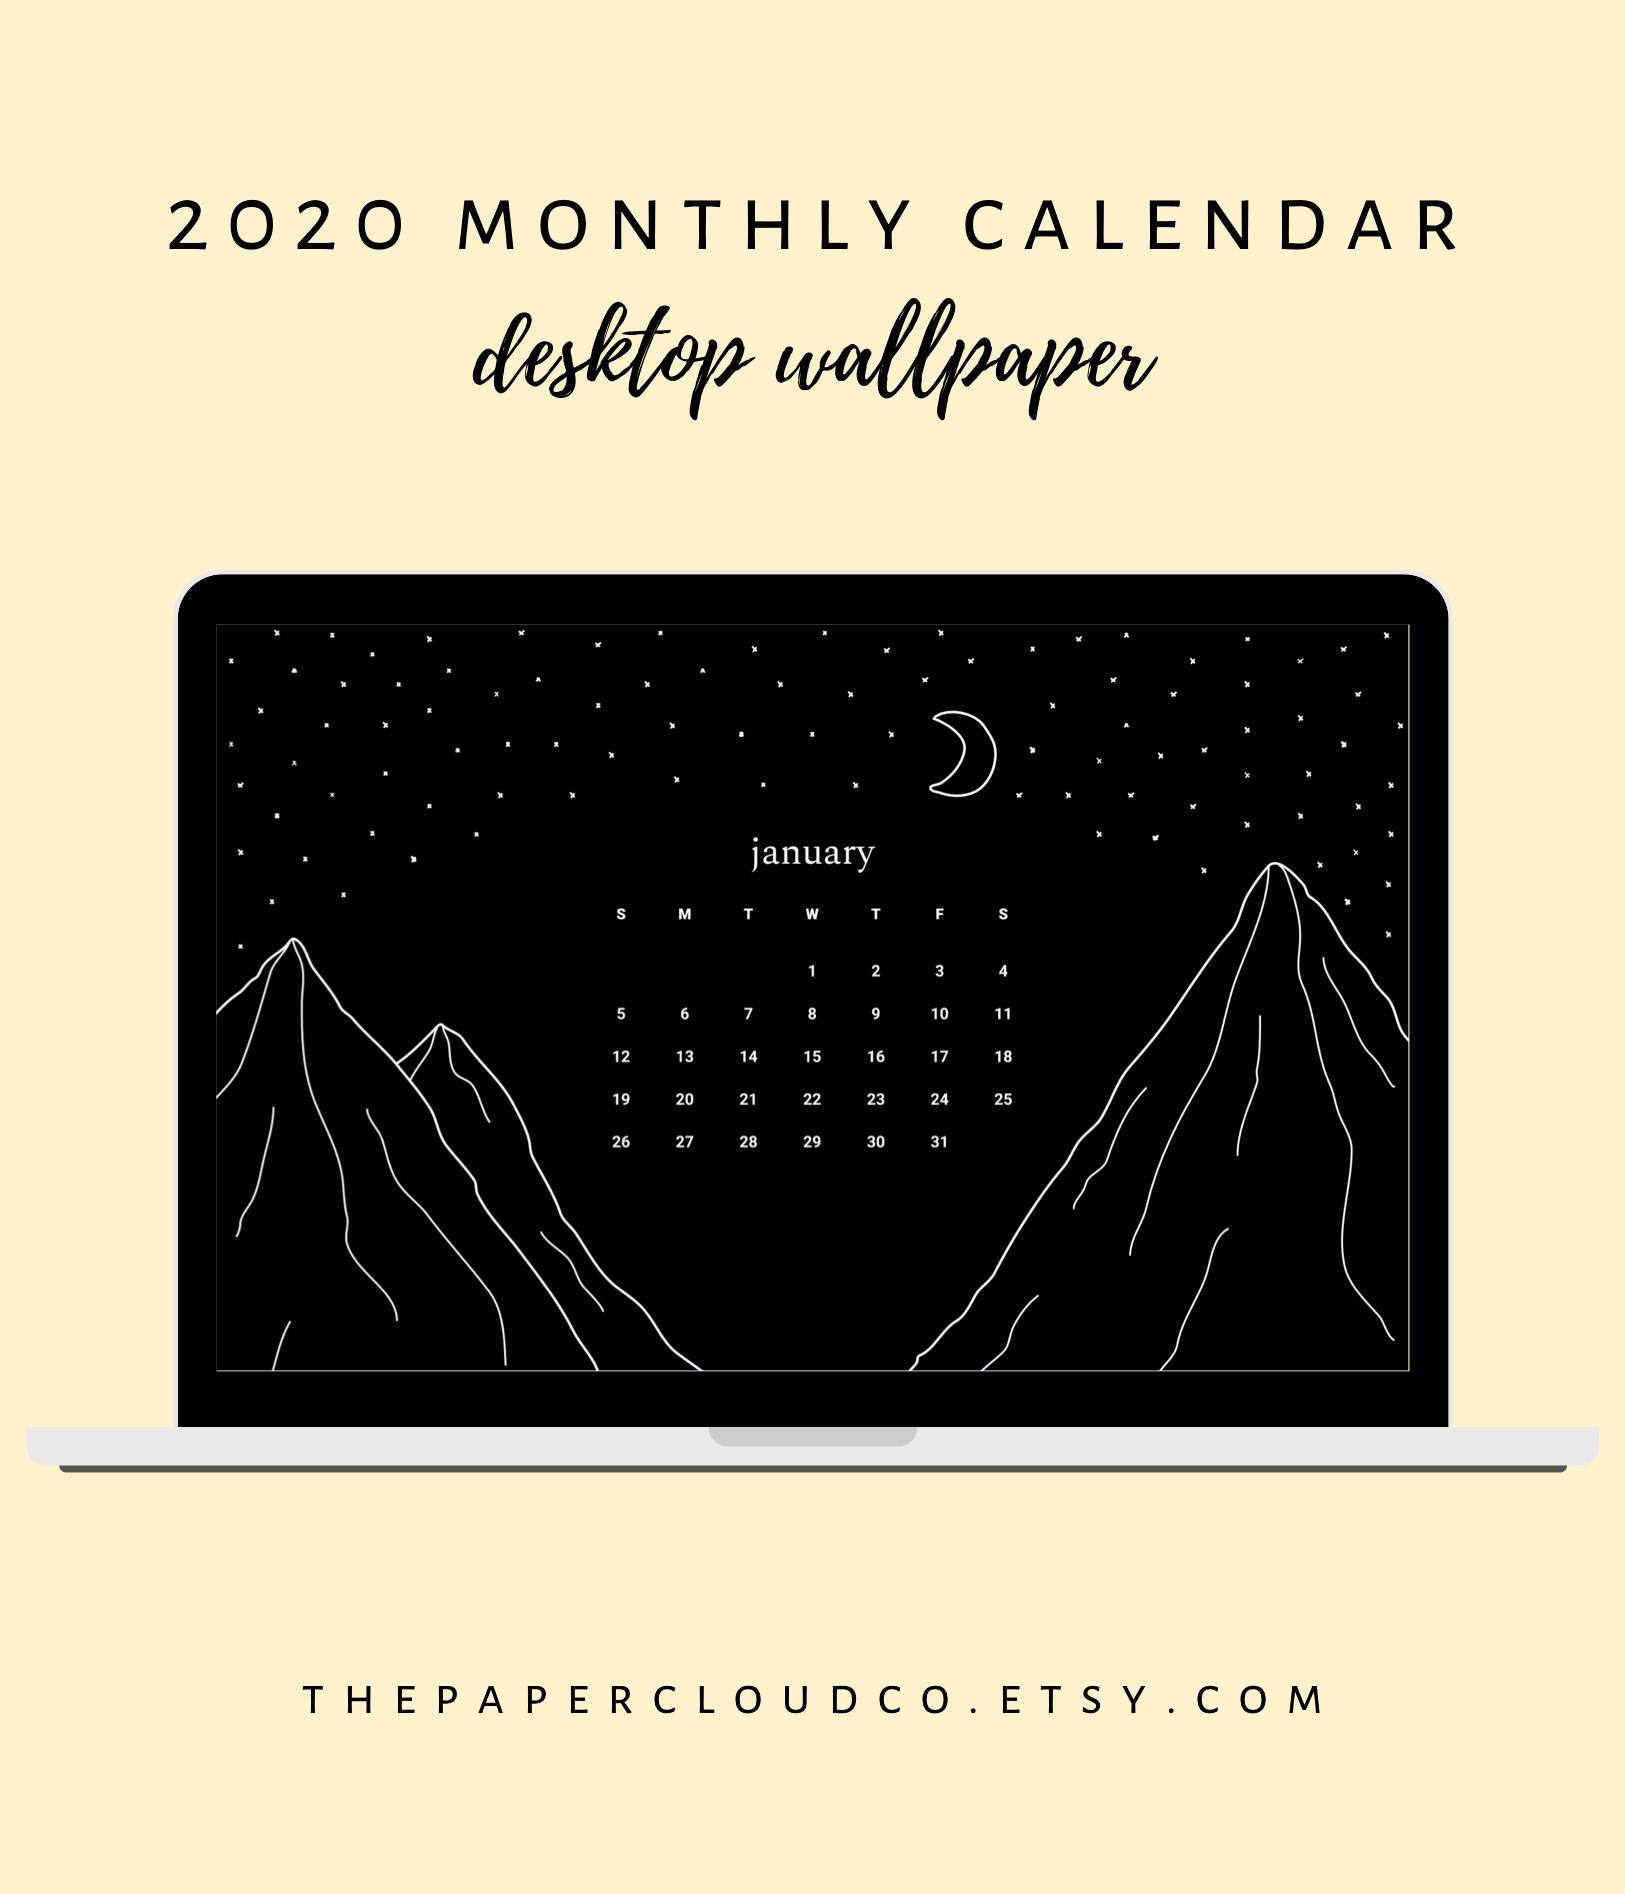 2020 Year And Month Calendar Desktop Wallpaper Background Etsy